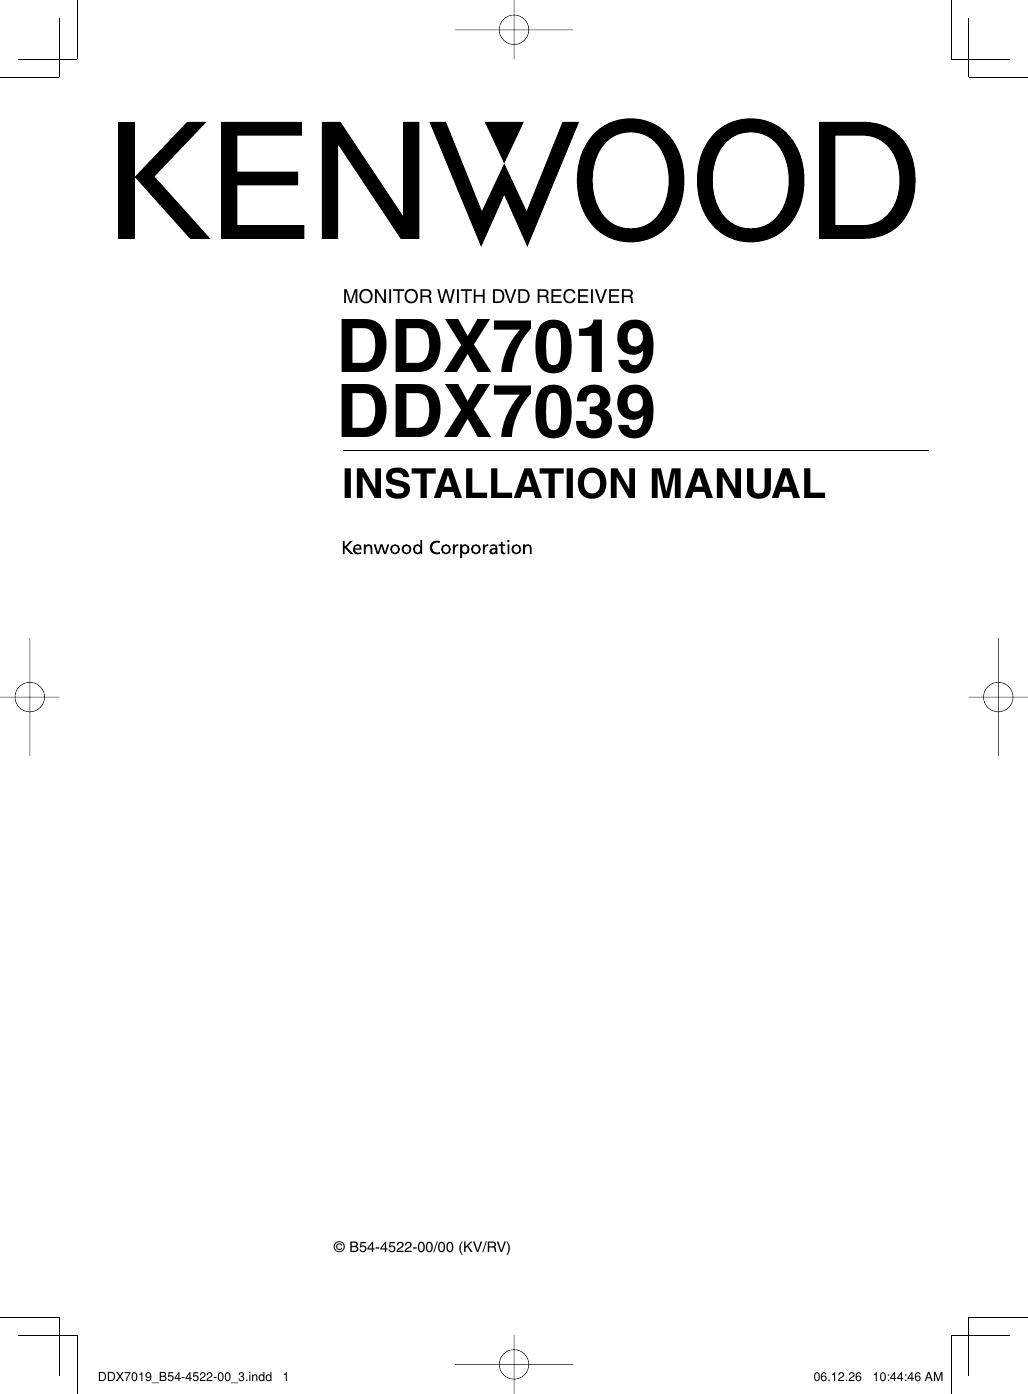 Kenwood DDX7019_B54 4522 00_3 If Not Then Manuals\DDX7019